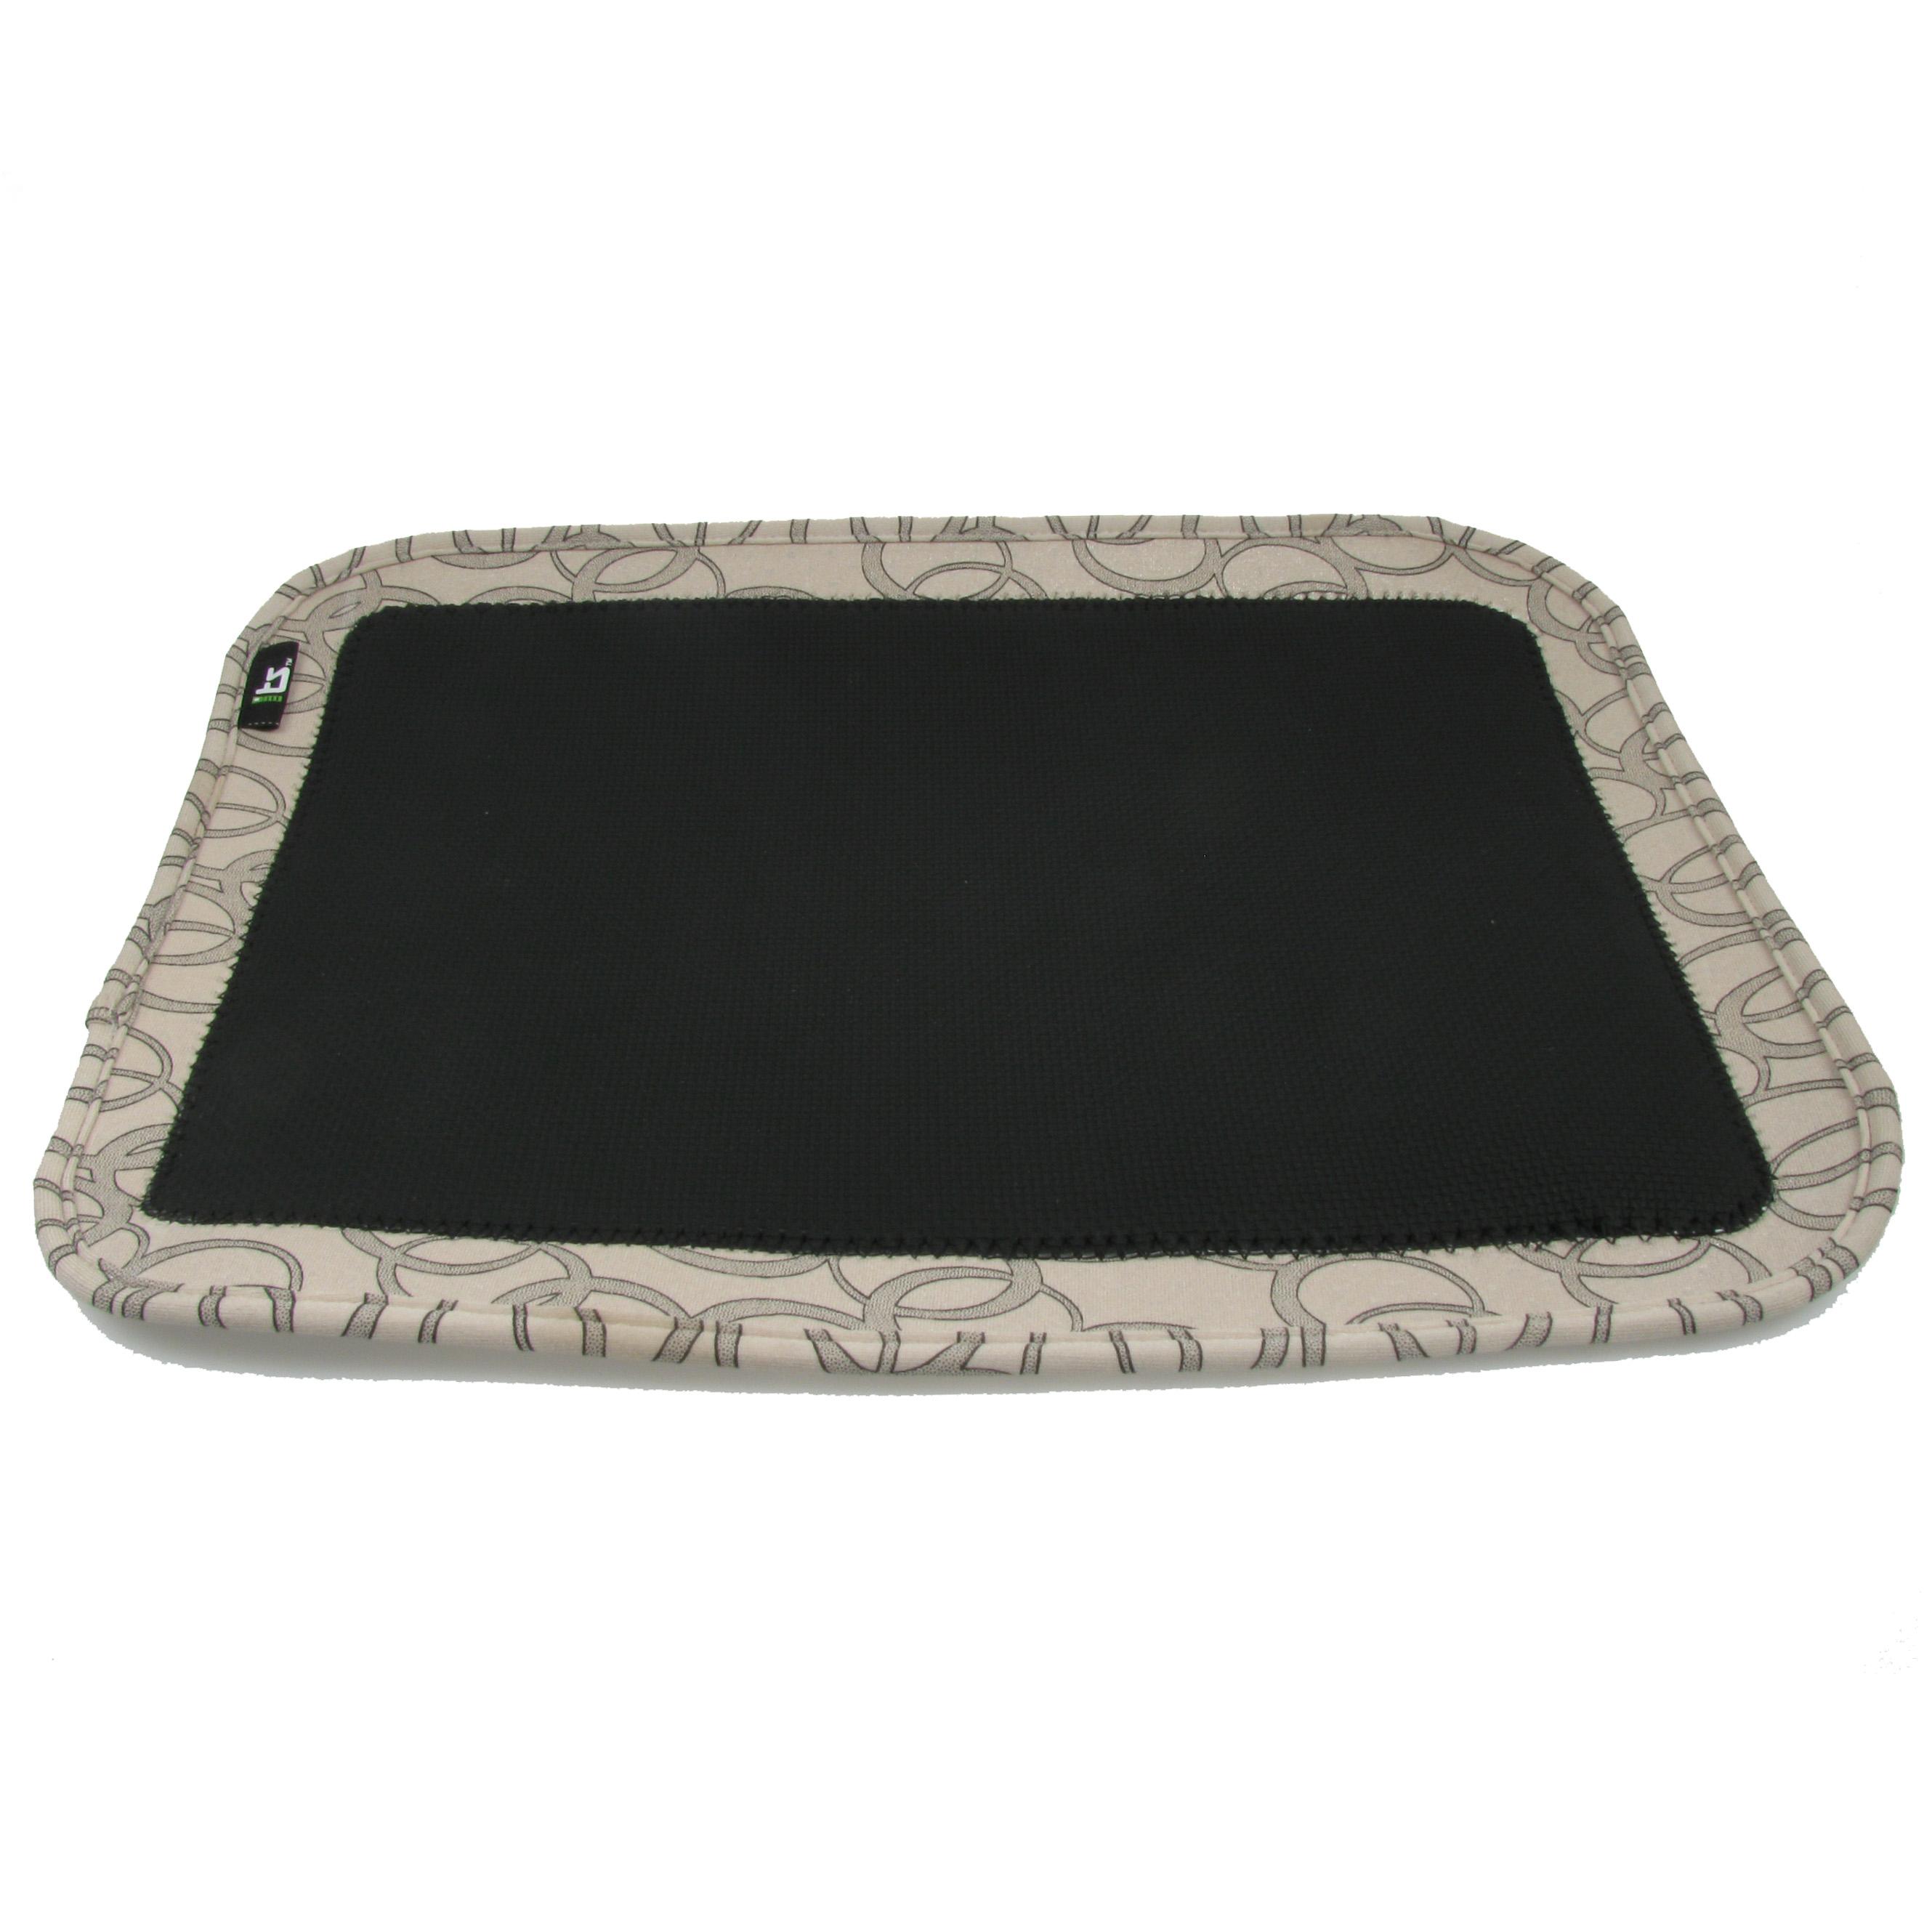 hot desk heat air mat for rework insulation skid itm pad mats iron soldering gun station resistant silicone welding showpin non bga